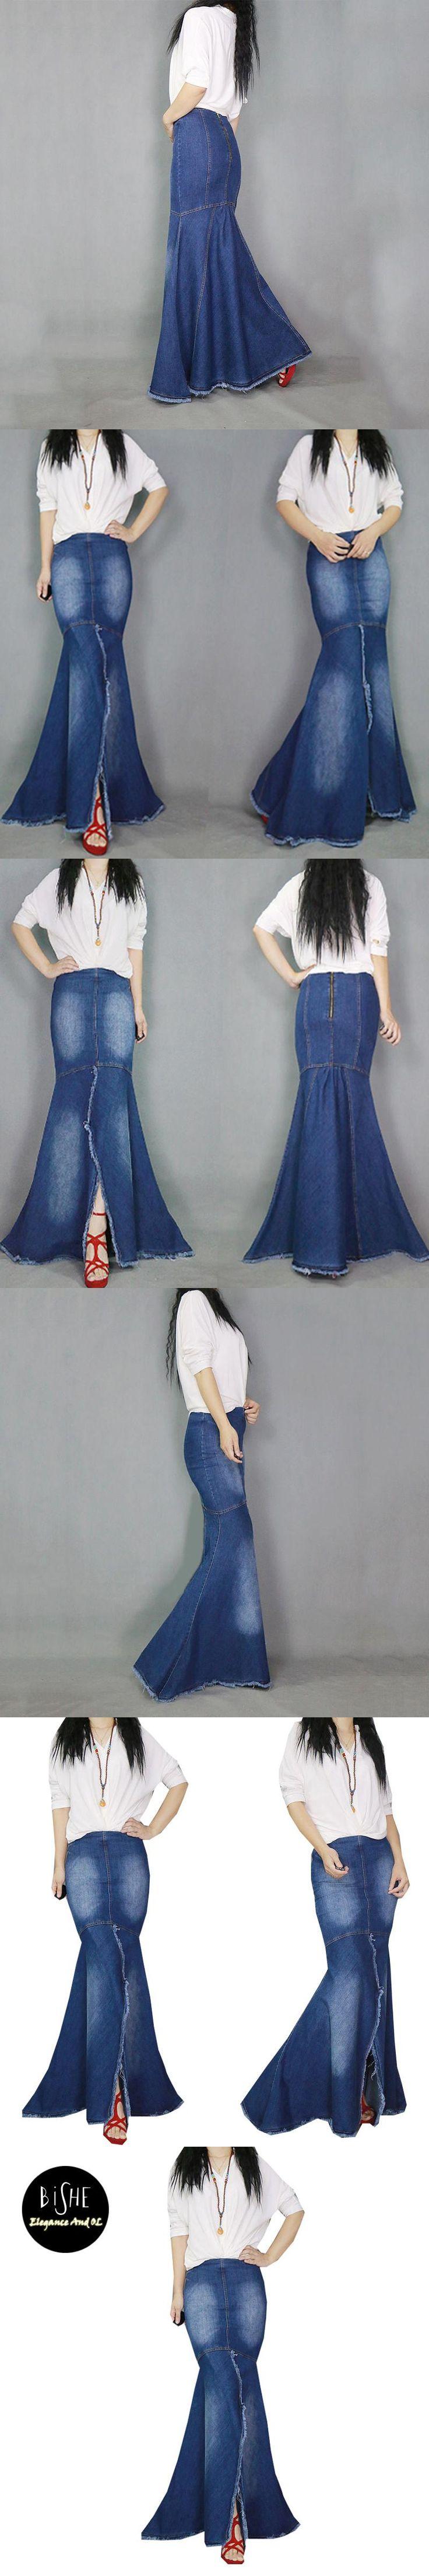 BiSHE High Quality Long Mermaid Skirt Denim Jupe Femme Maxi Saia Longa Jeans Office High Waist 2017 Summer Trumpet Falda